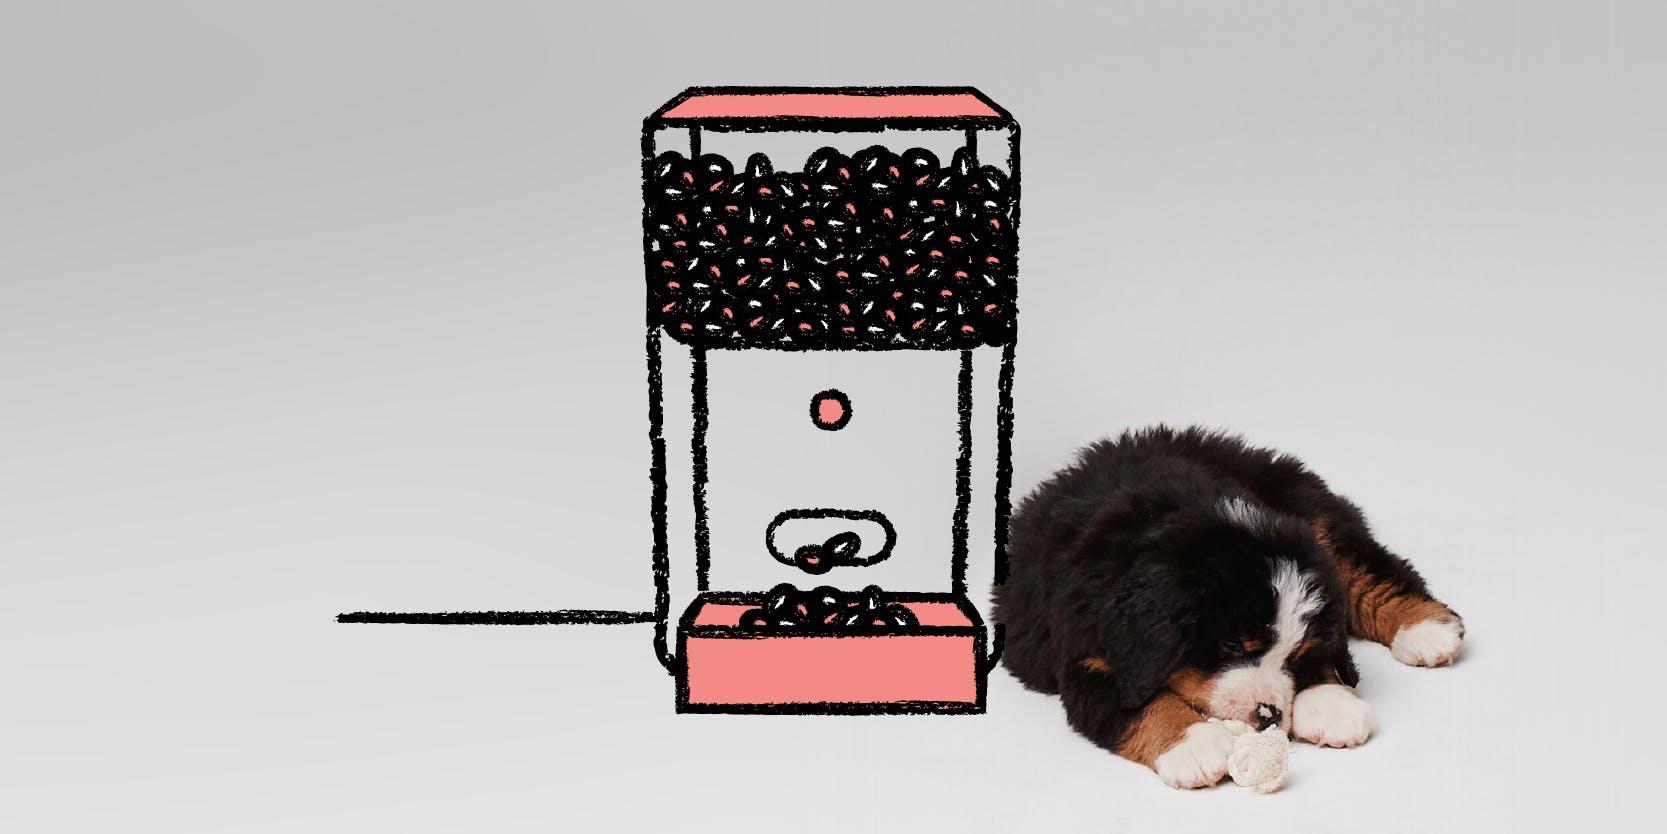 Dog at vending machine